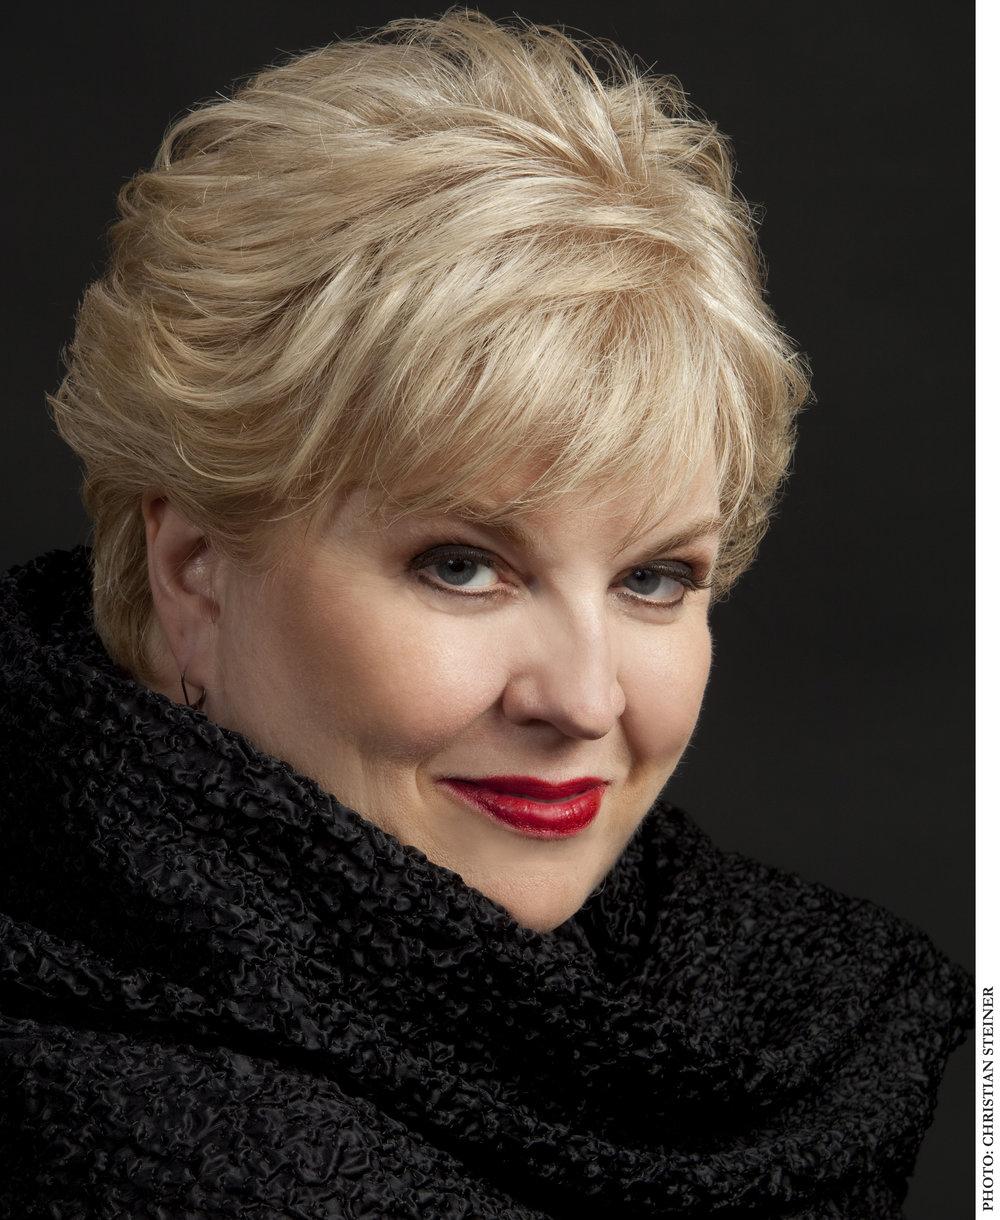 Grammy Award-winning American soprano, Christine Brewer